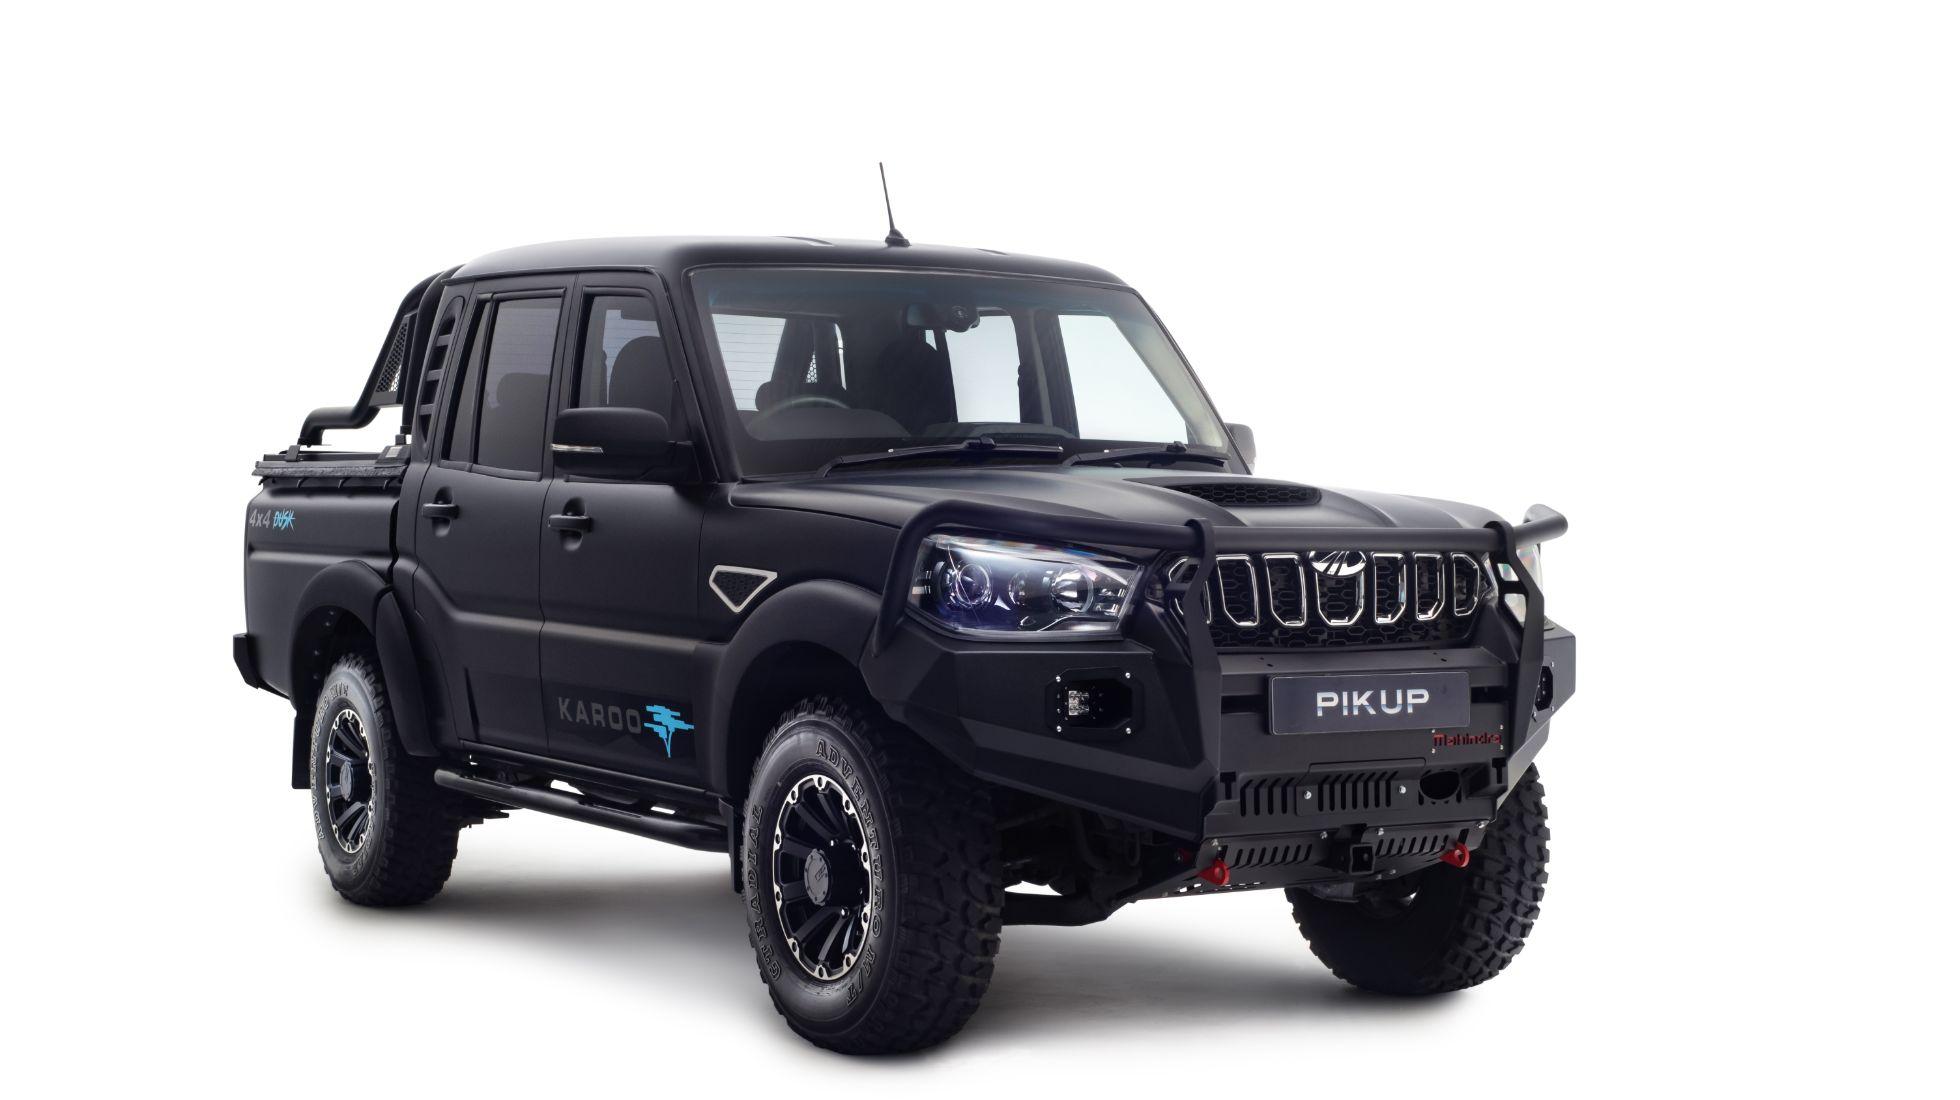 Mahindra Scorpio Karoo Dusk available in limited numbers